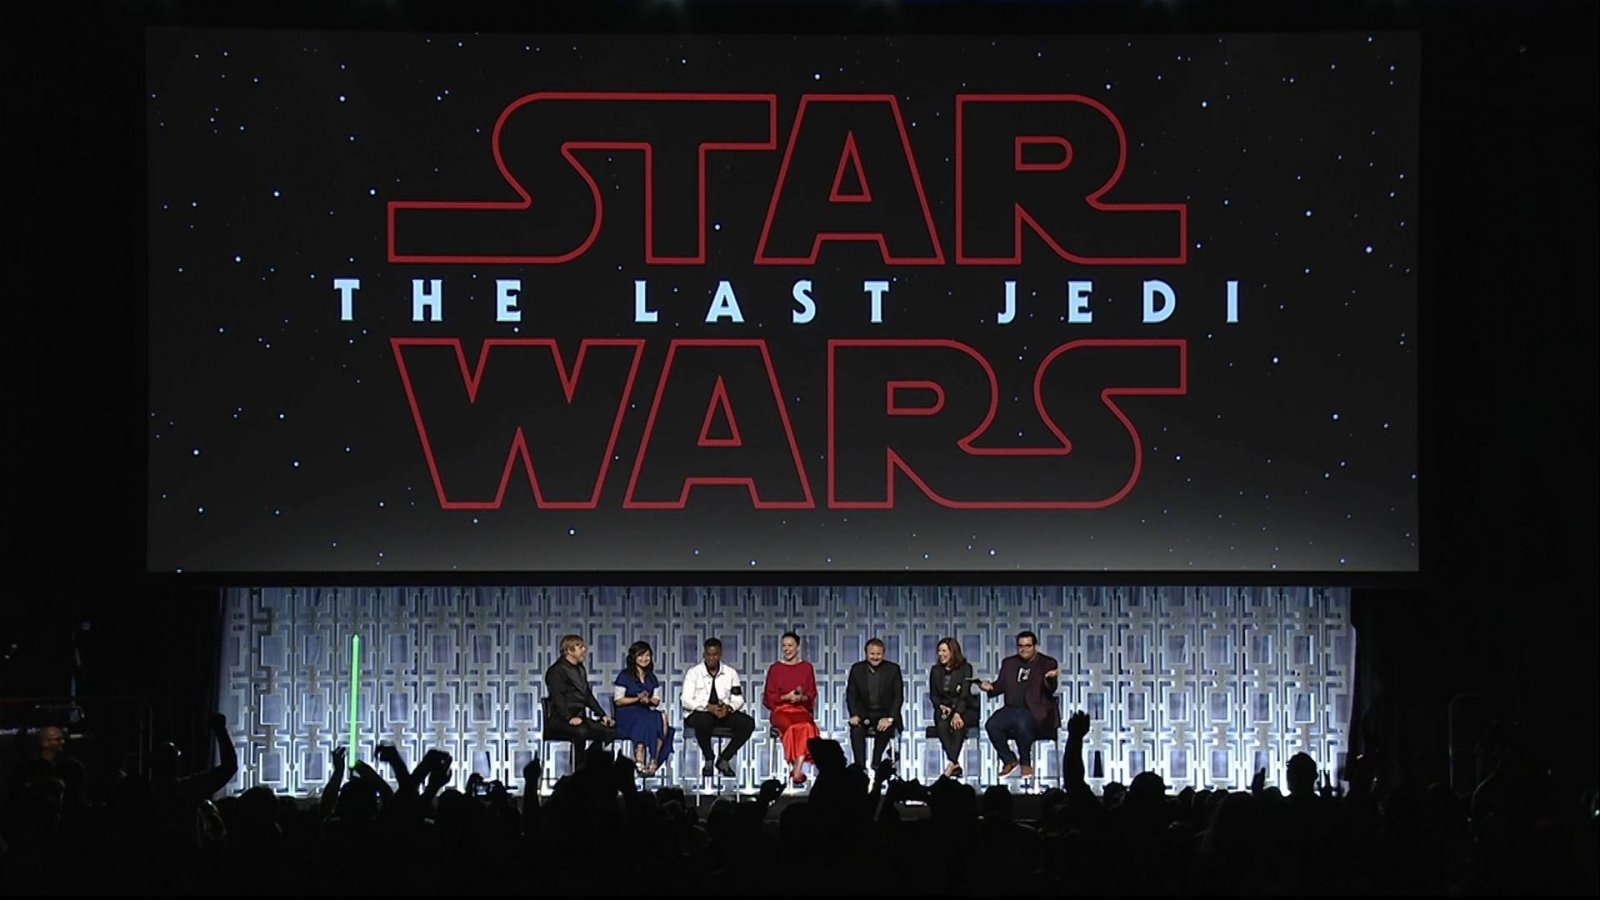 star-wars-the-last-jedi-celebration-2017-the-last-jedi-panel